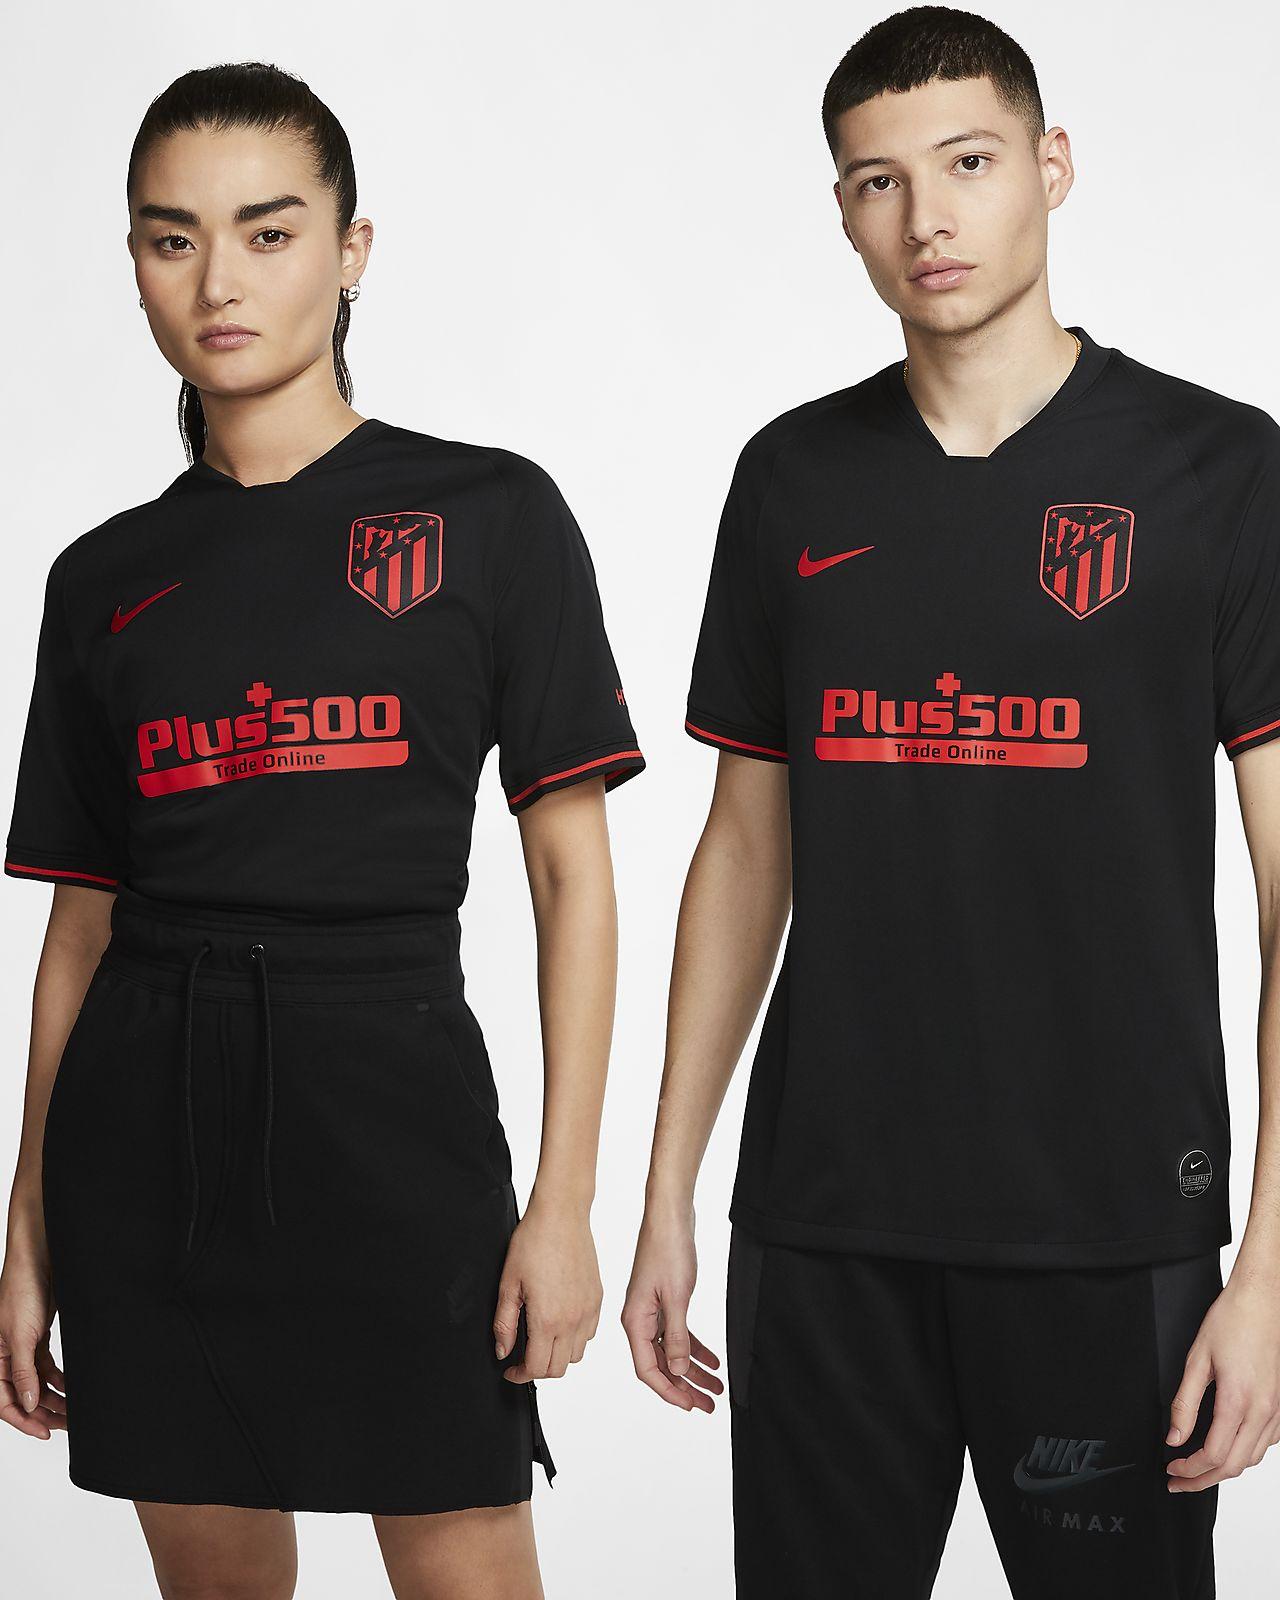 Atlético de Madrid 2019/20 Stadium Away Erkek Futbol Forması